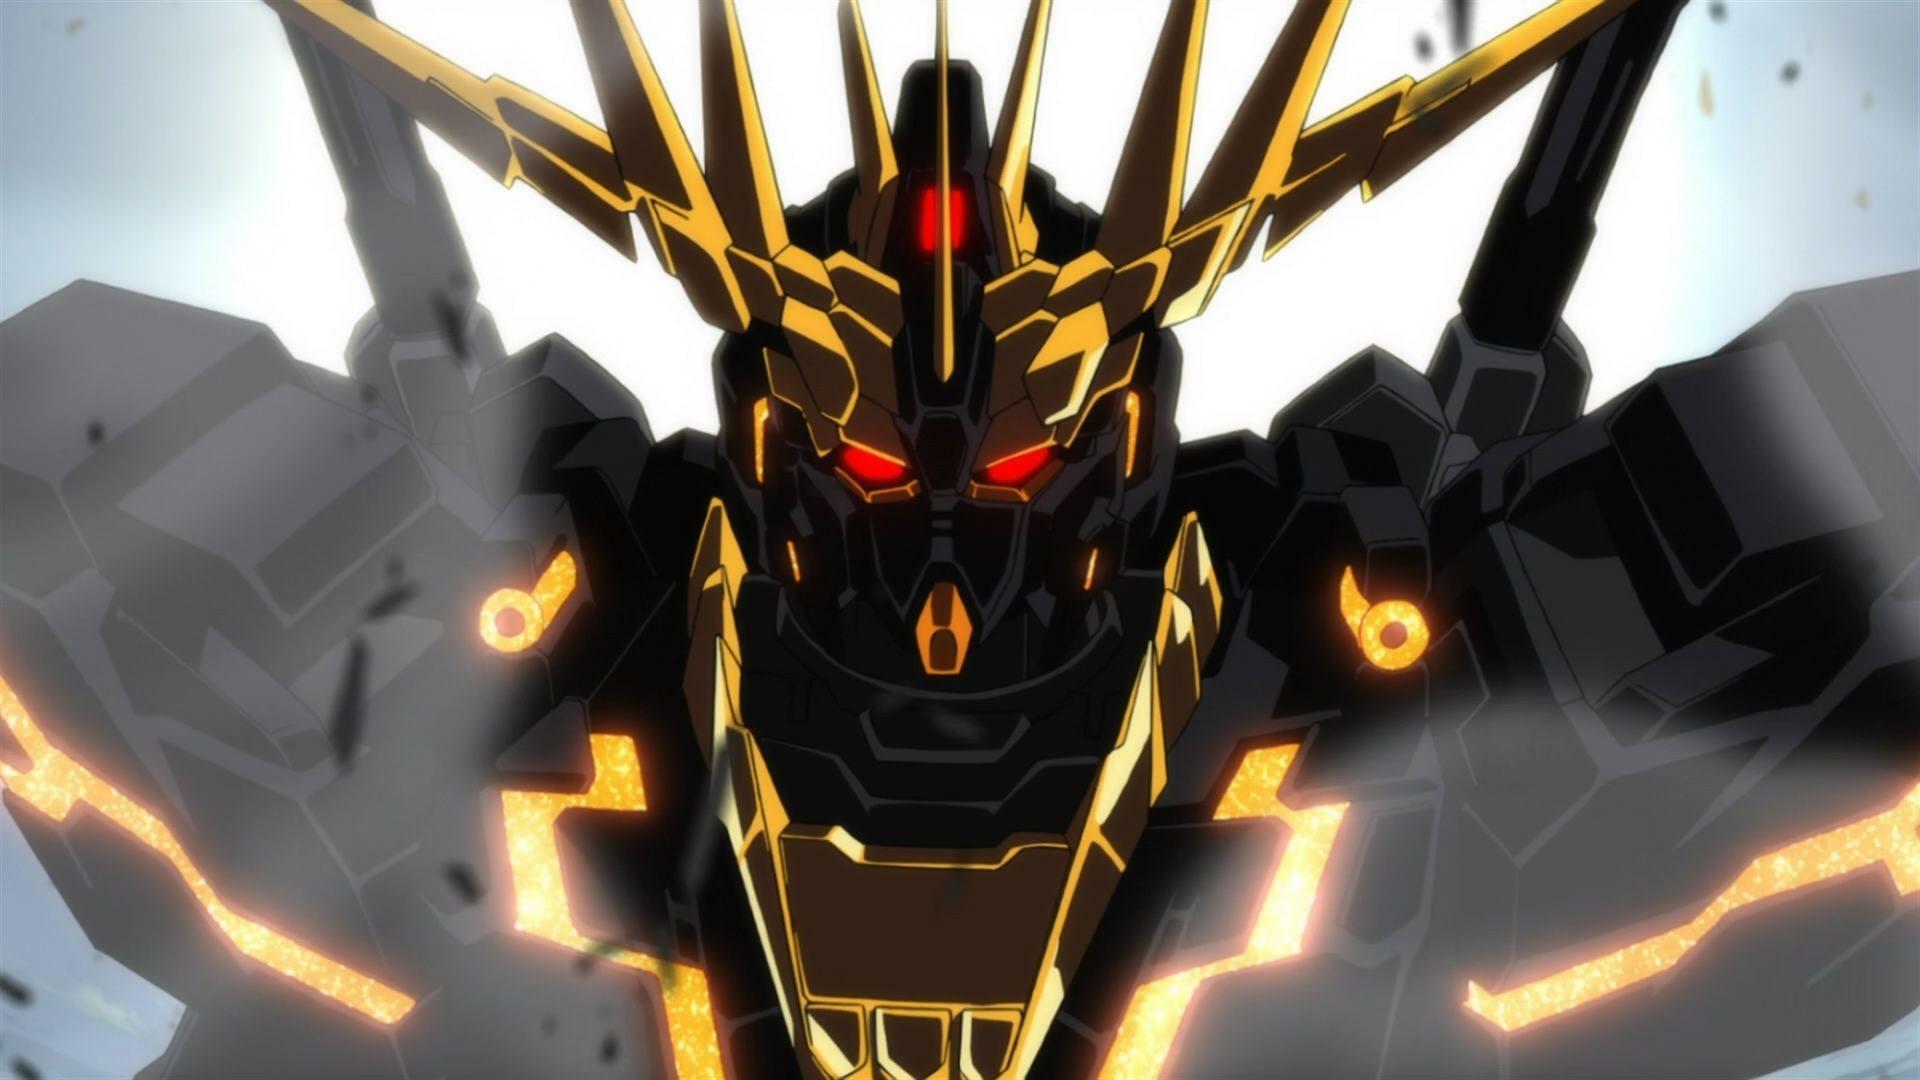 Gundam Unicorn Wallpaper Wide As Wallpaper HD